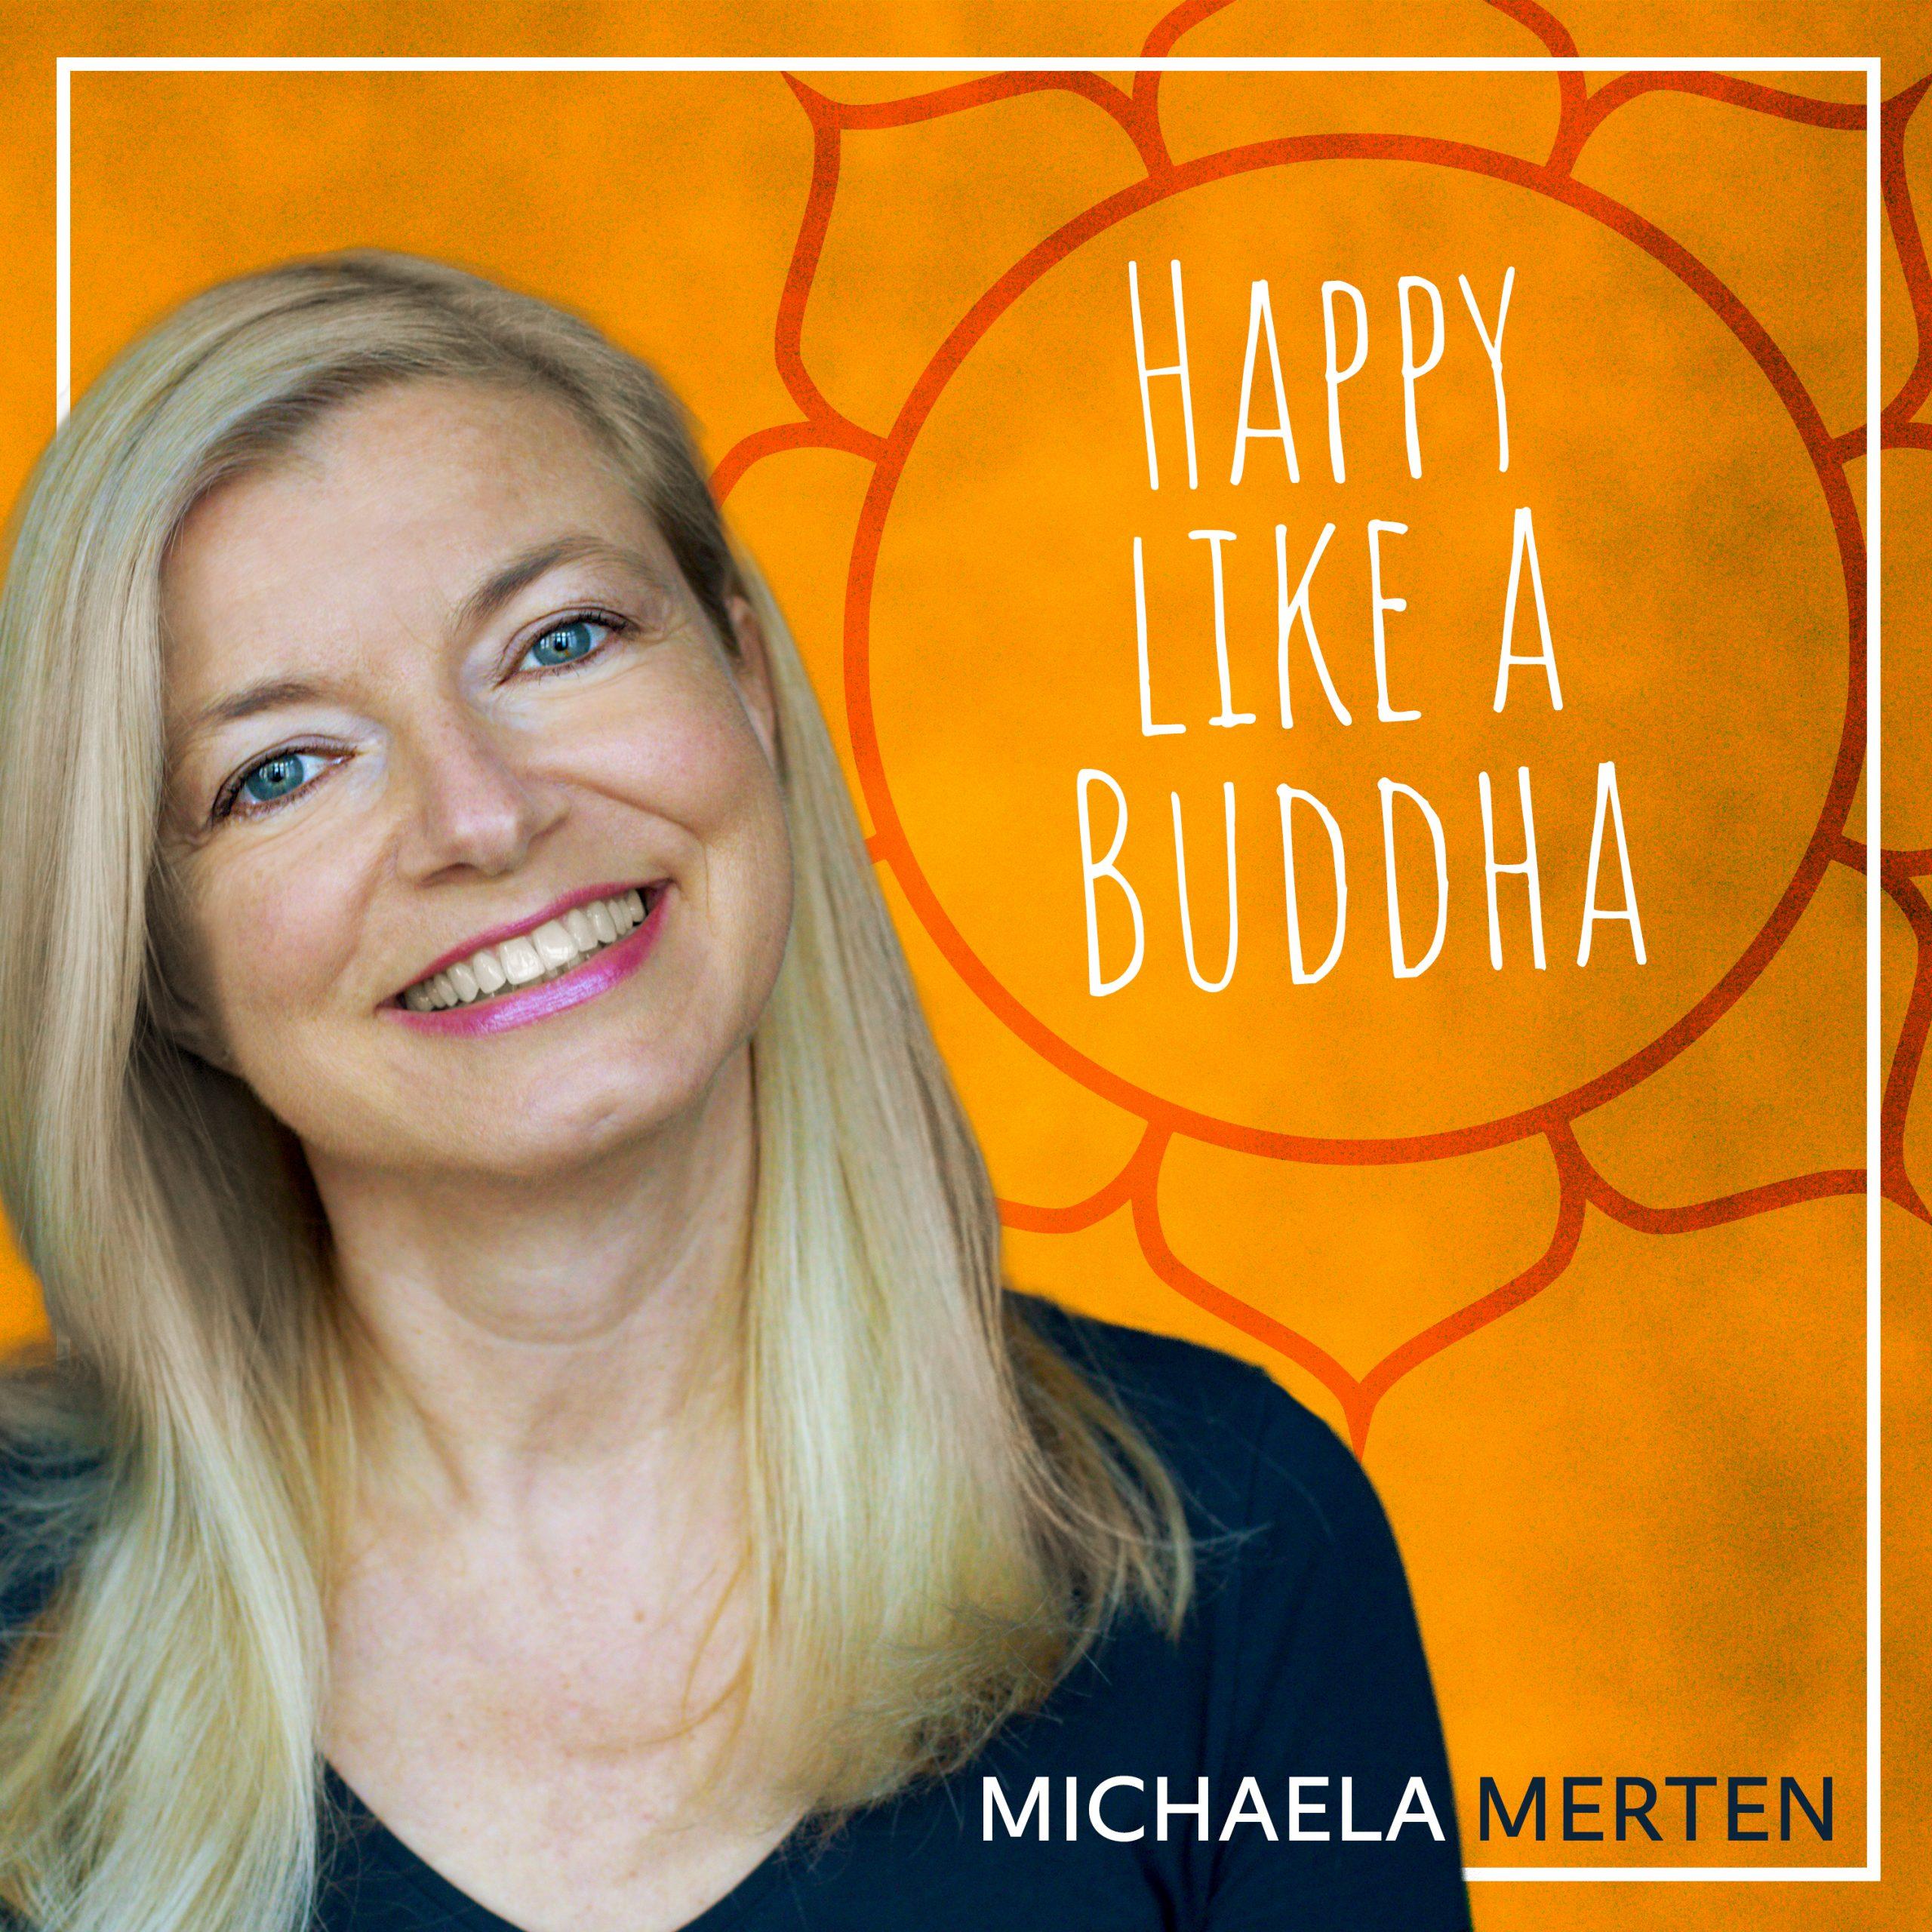 Thumbnail des Podcasts 'Happy like a Buddha' von Michaela Merten